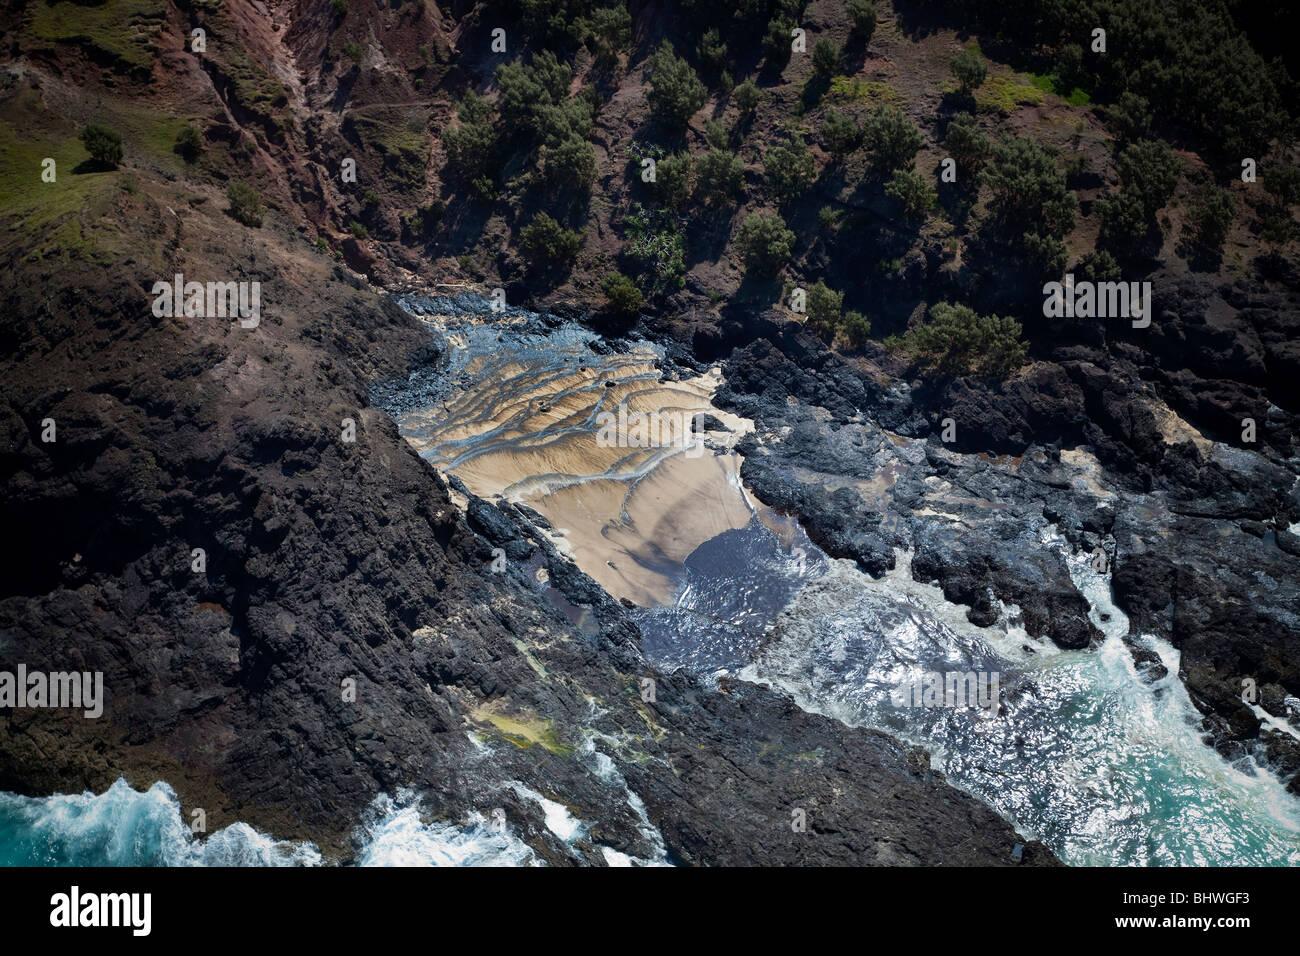 Oil spill washing up on coastline Moreton Island Queensland Australia - Stock Image